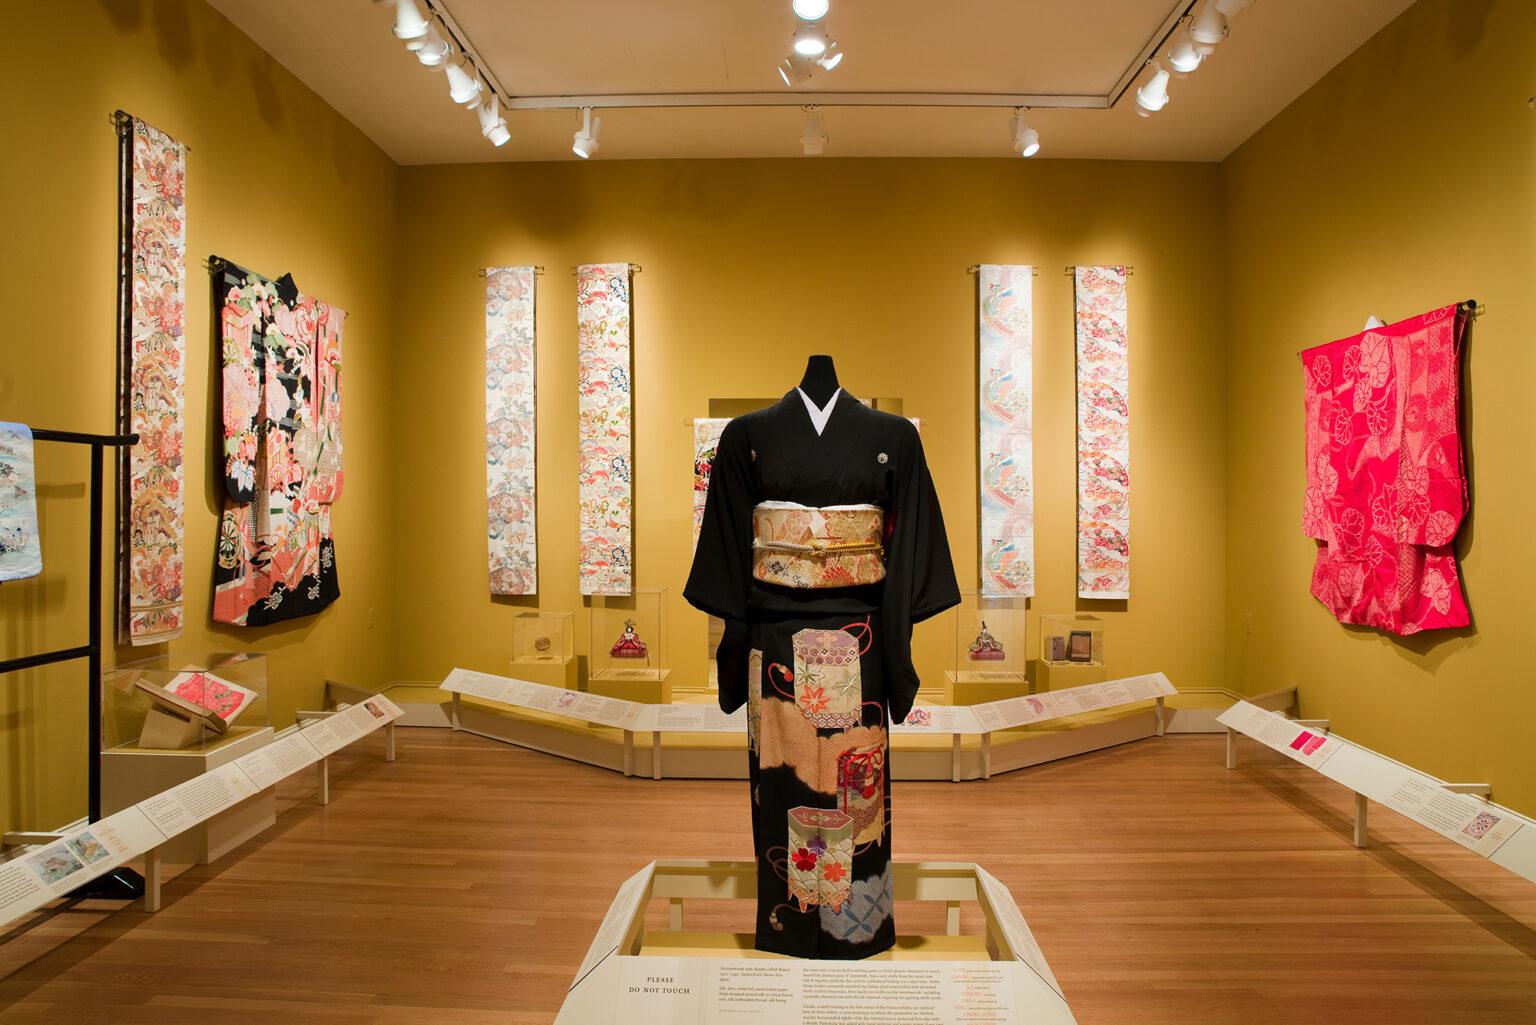 Installation view, Kimono & Obi: Romantic Echoes From Japan's Golden Age. Photo by Mitro Hood